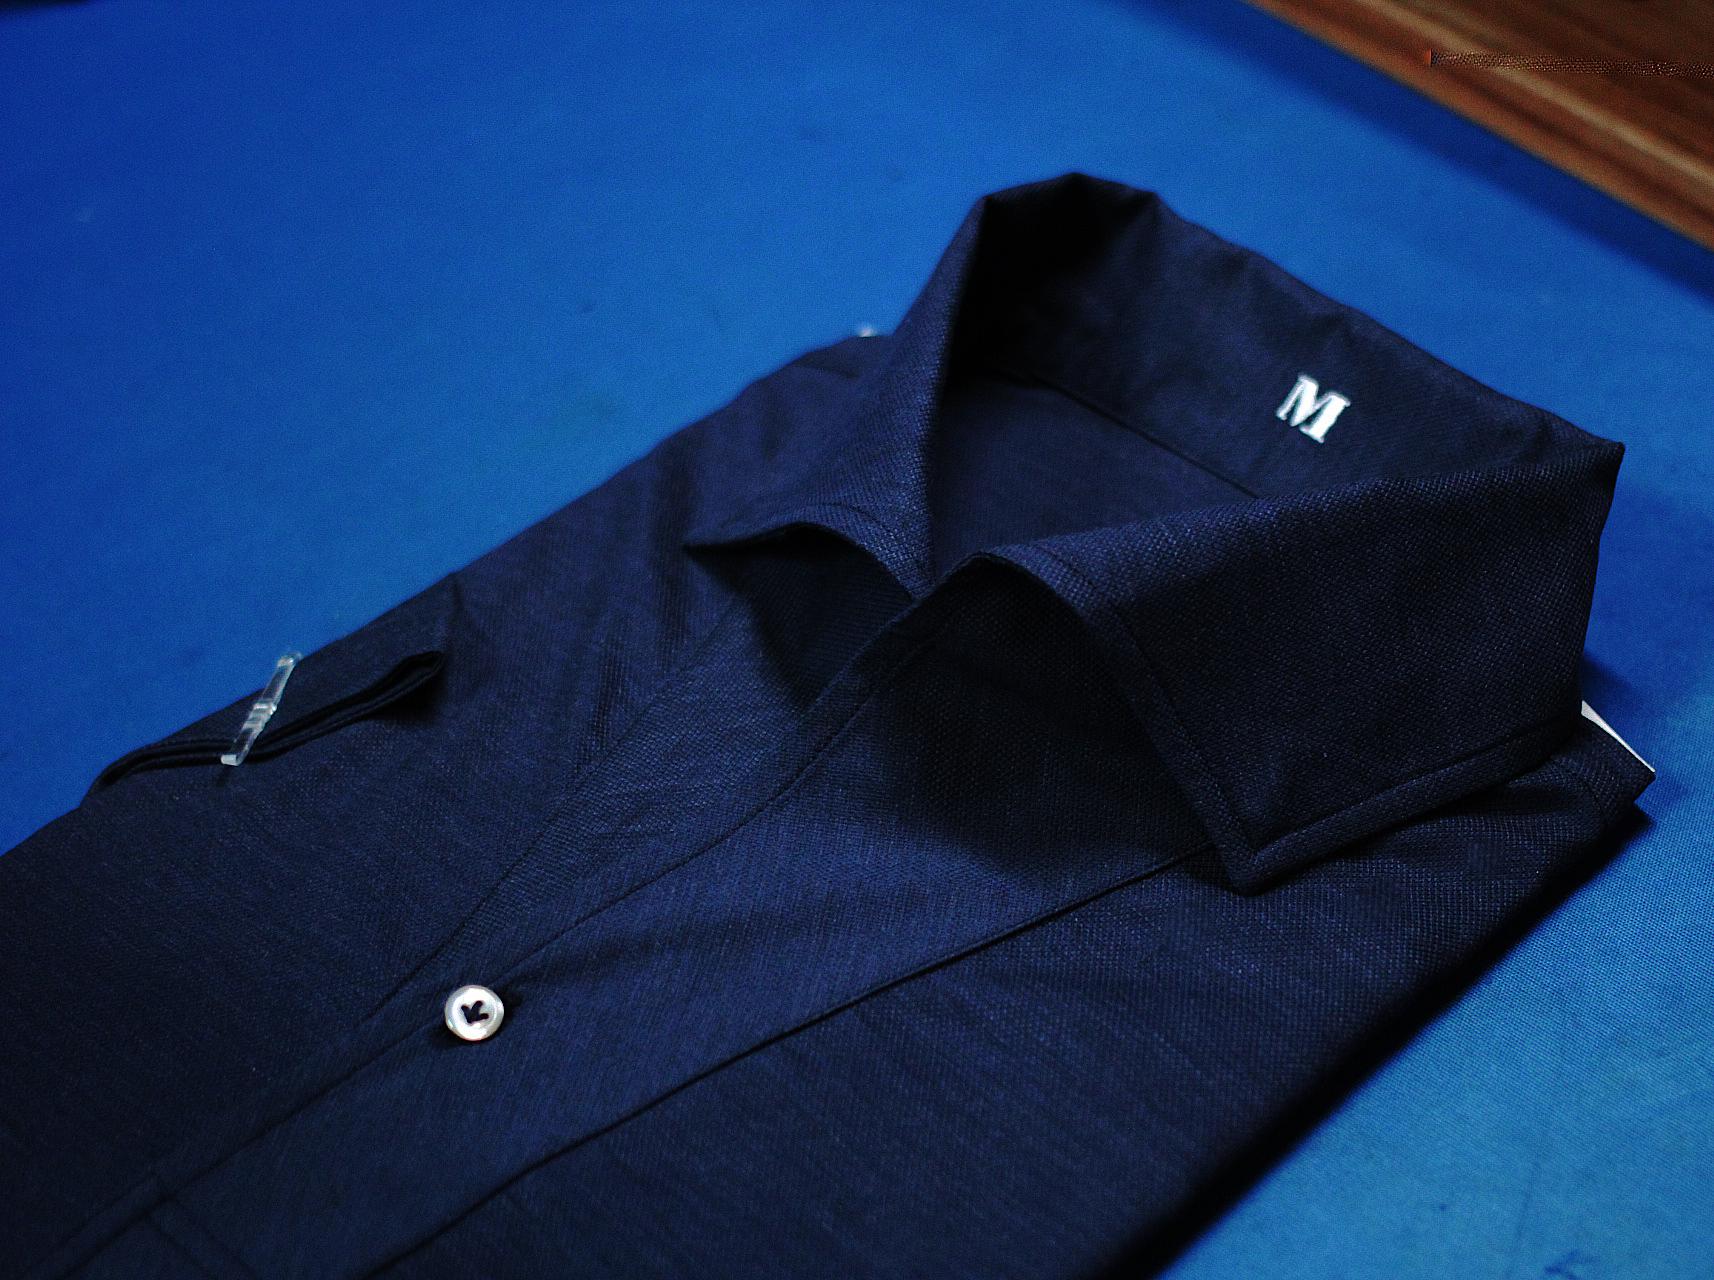 Weave Blue Navy Polo Shirt | Made Suits | Singapore Made to Measure Polo | Bespoke Tailor closeup.JPG